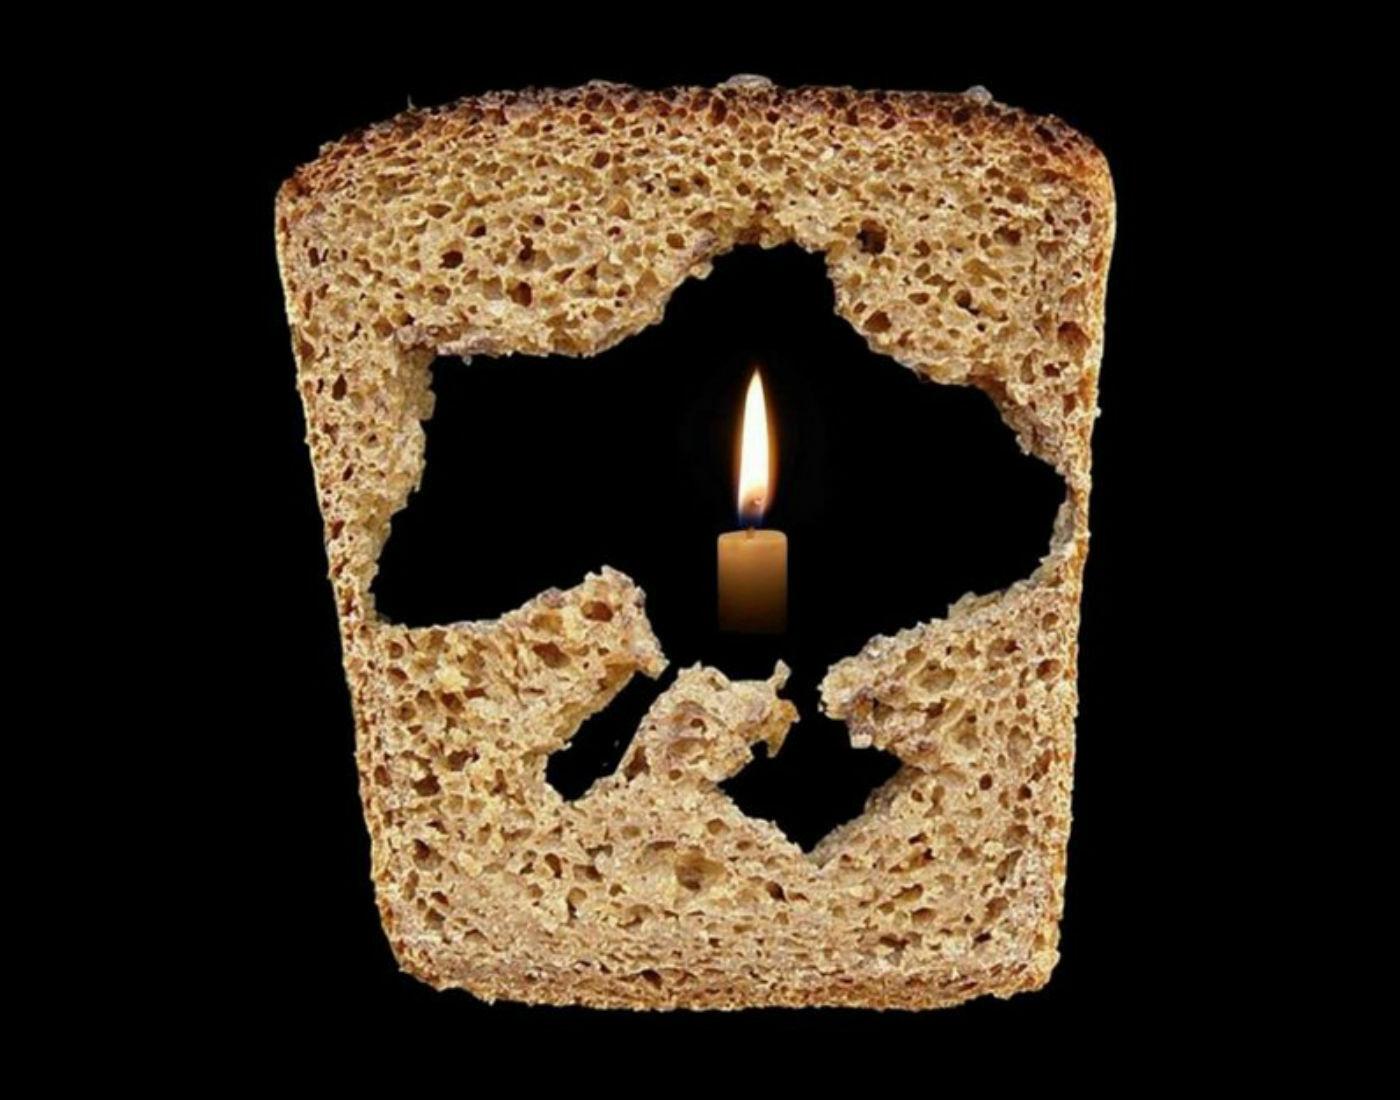 Картинки на день голодомора